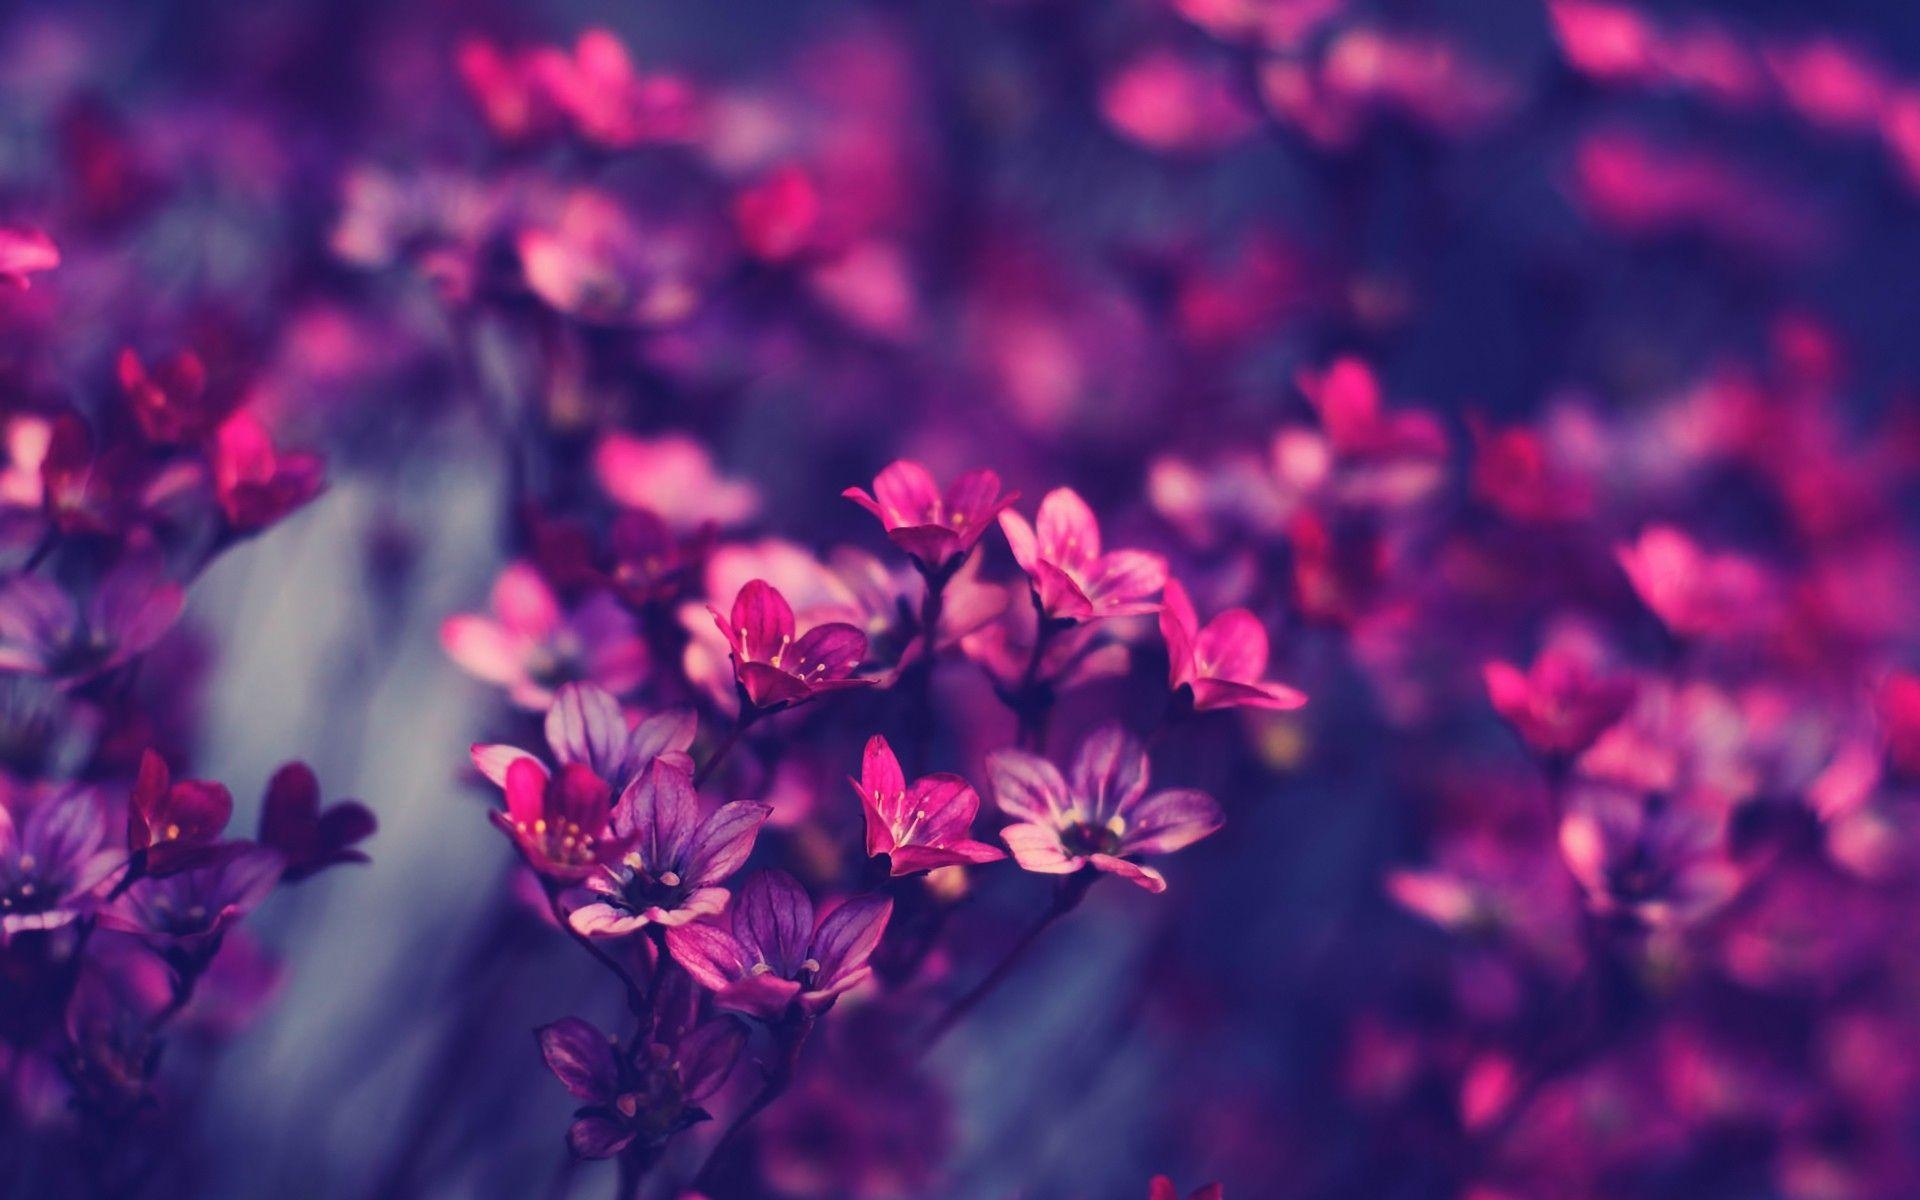 Purple pink flowers wallpaper wallpapers in 2018 pinterest purple pink flowers wallpaper mightylinksfo